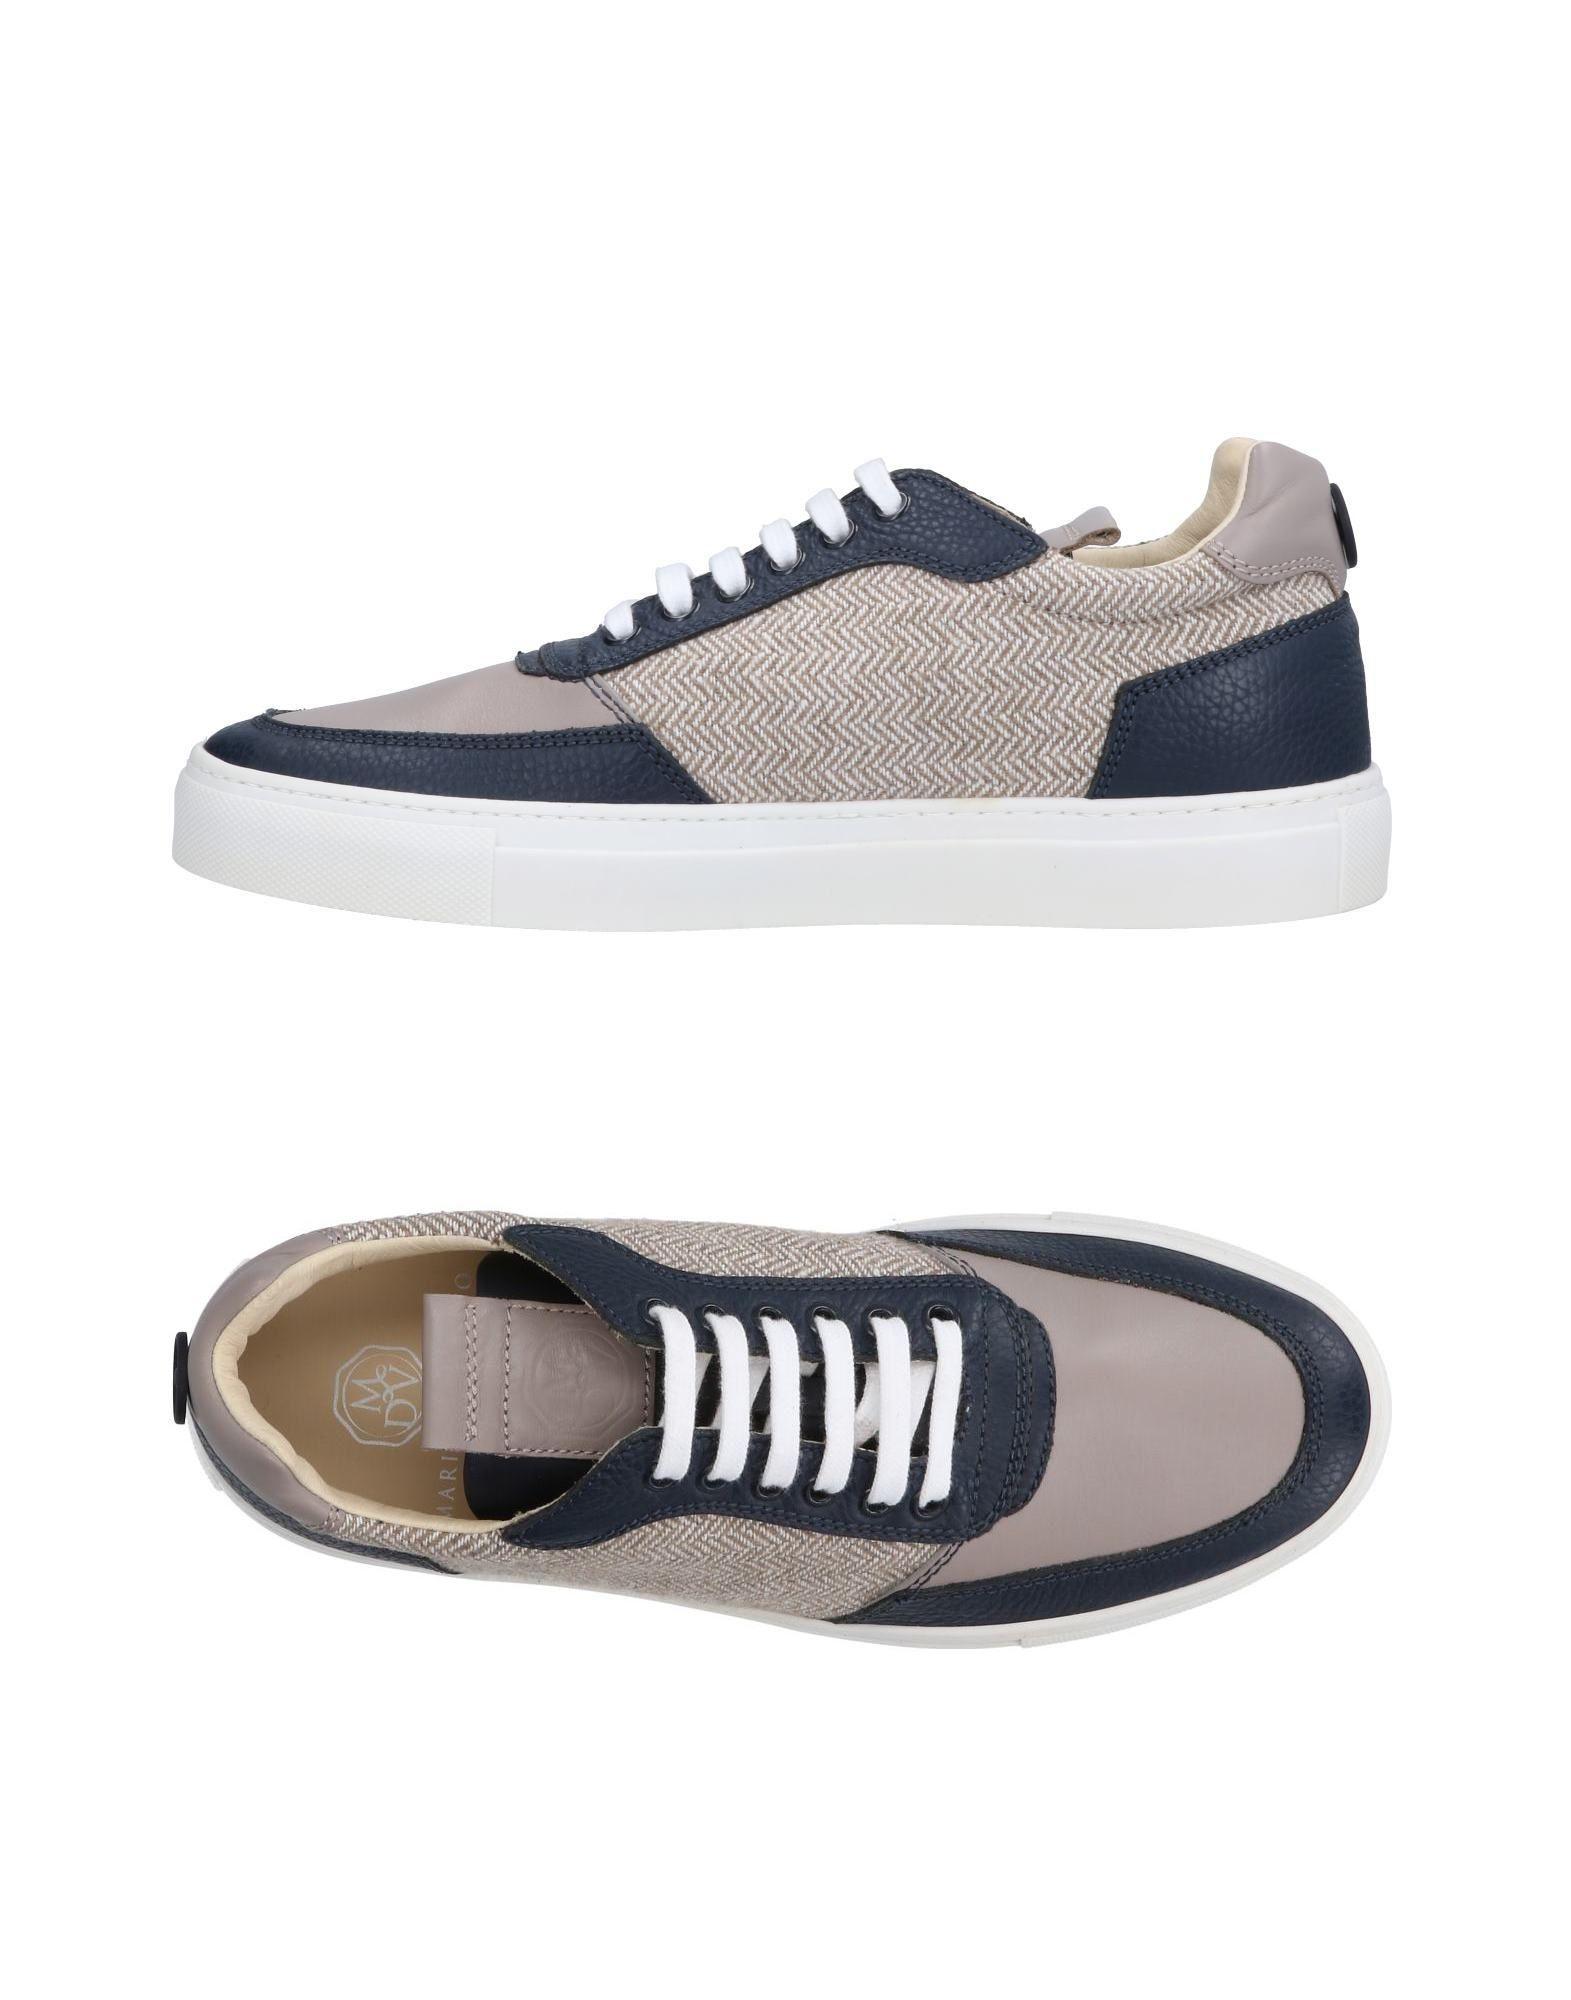 Rabatt echte Schuhe Mariano Di Vaio Sneakers Herren  11270918RX